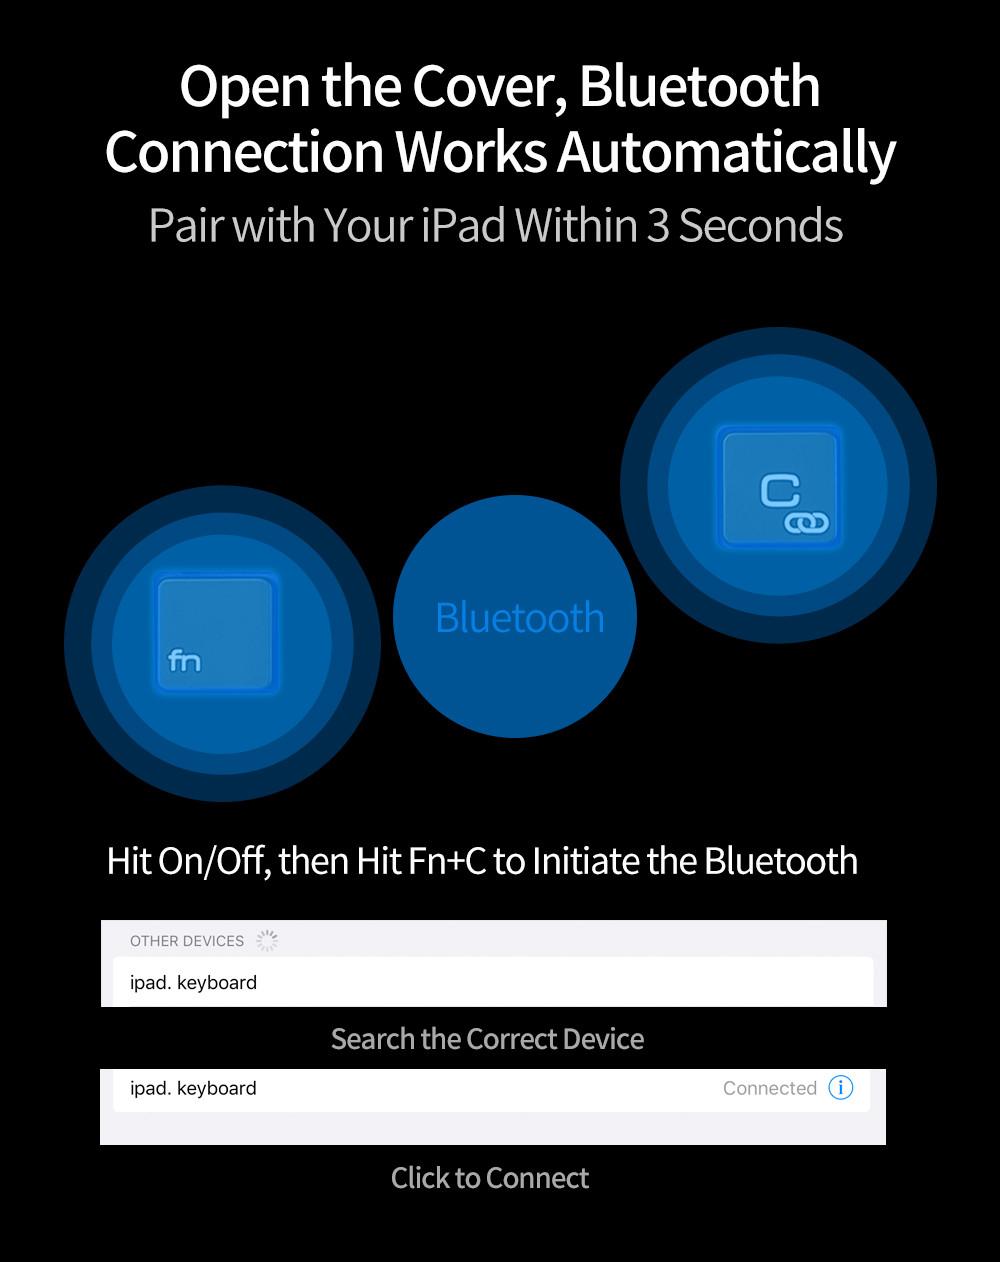 http://www.duxducis.com/wp-content/uploads/2019/04/ipad-10.5-bluetooth-keyboard-16.jpg